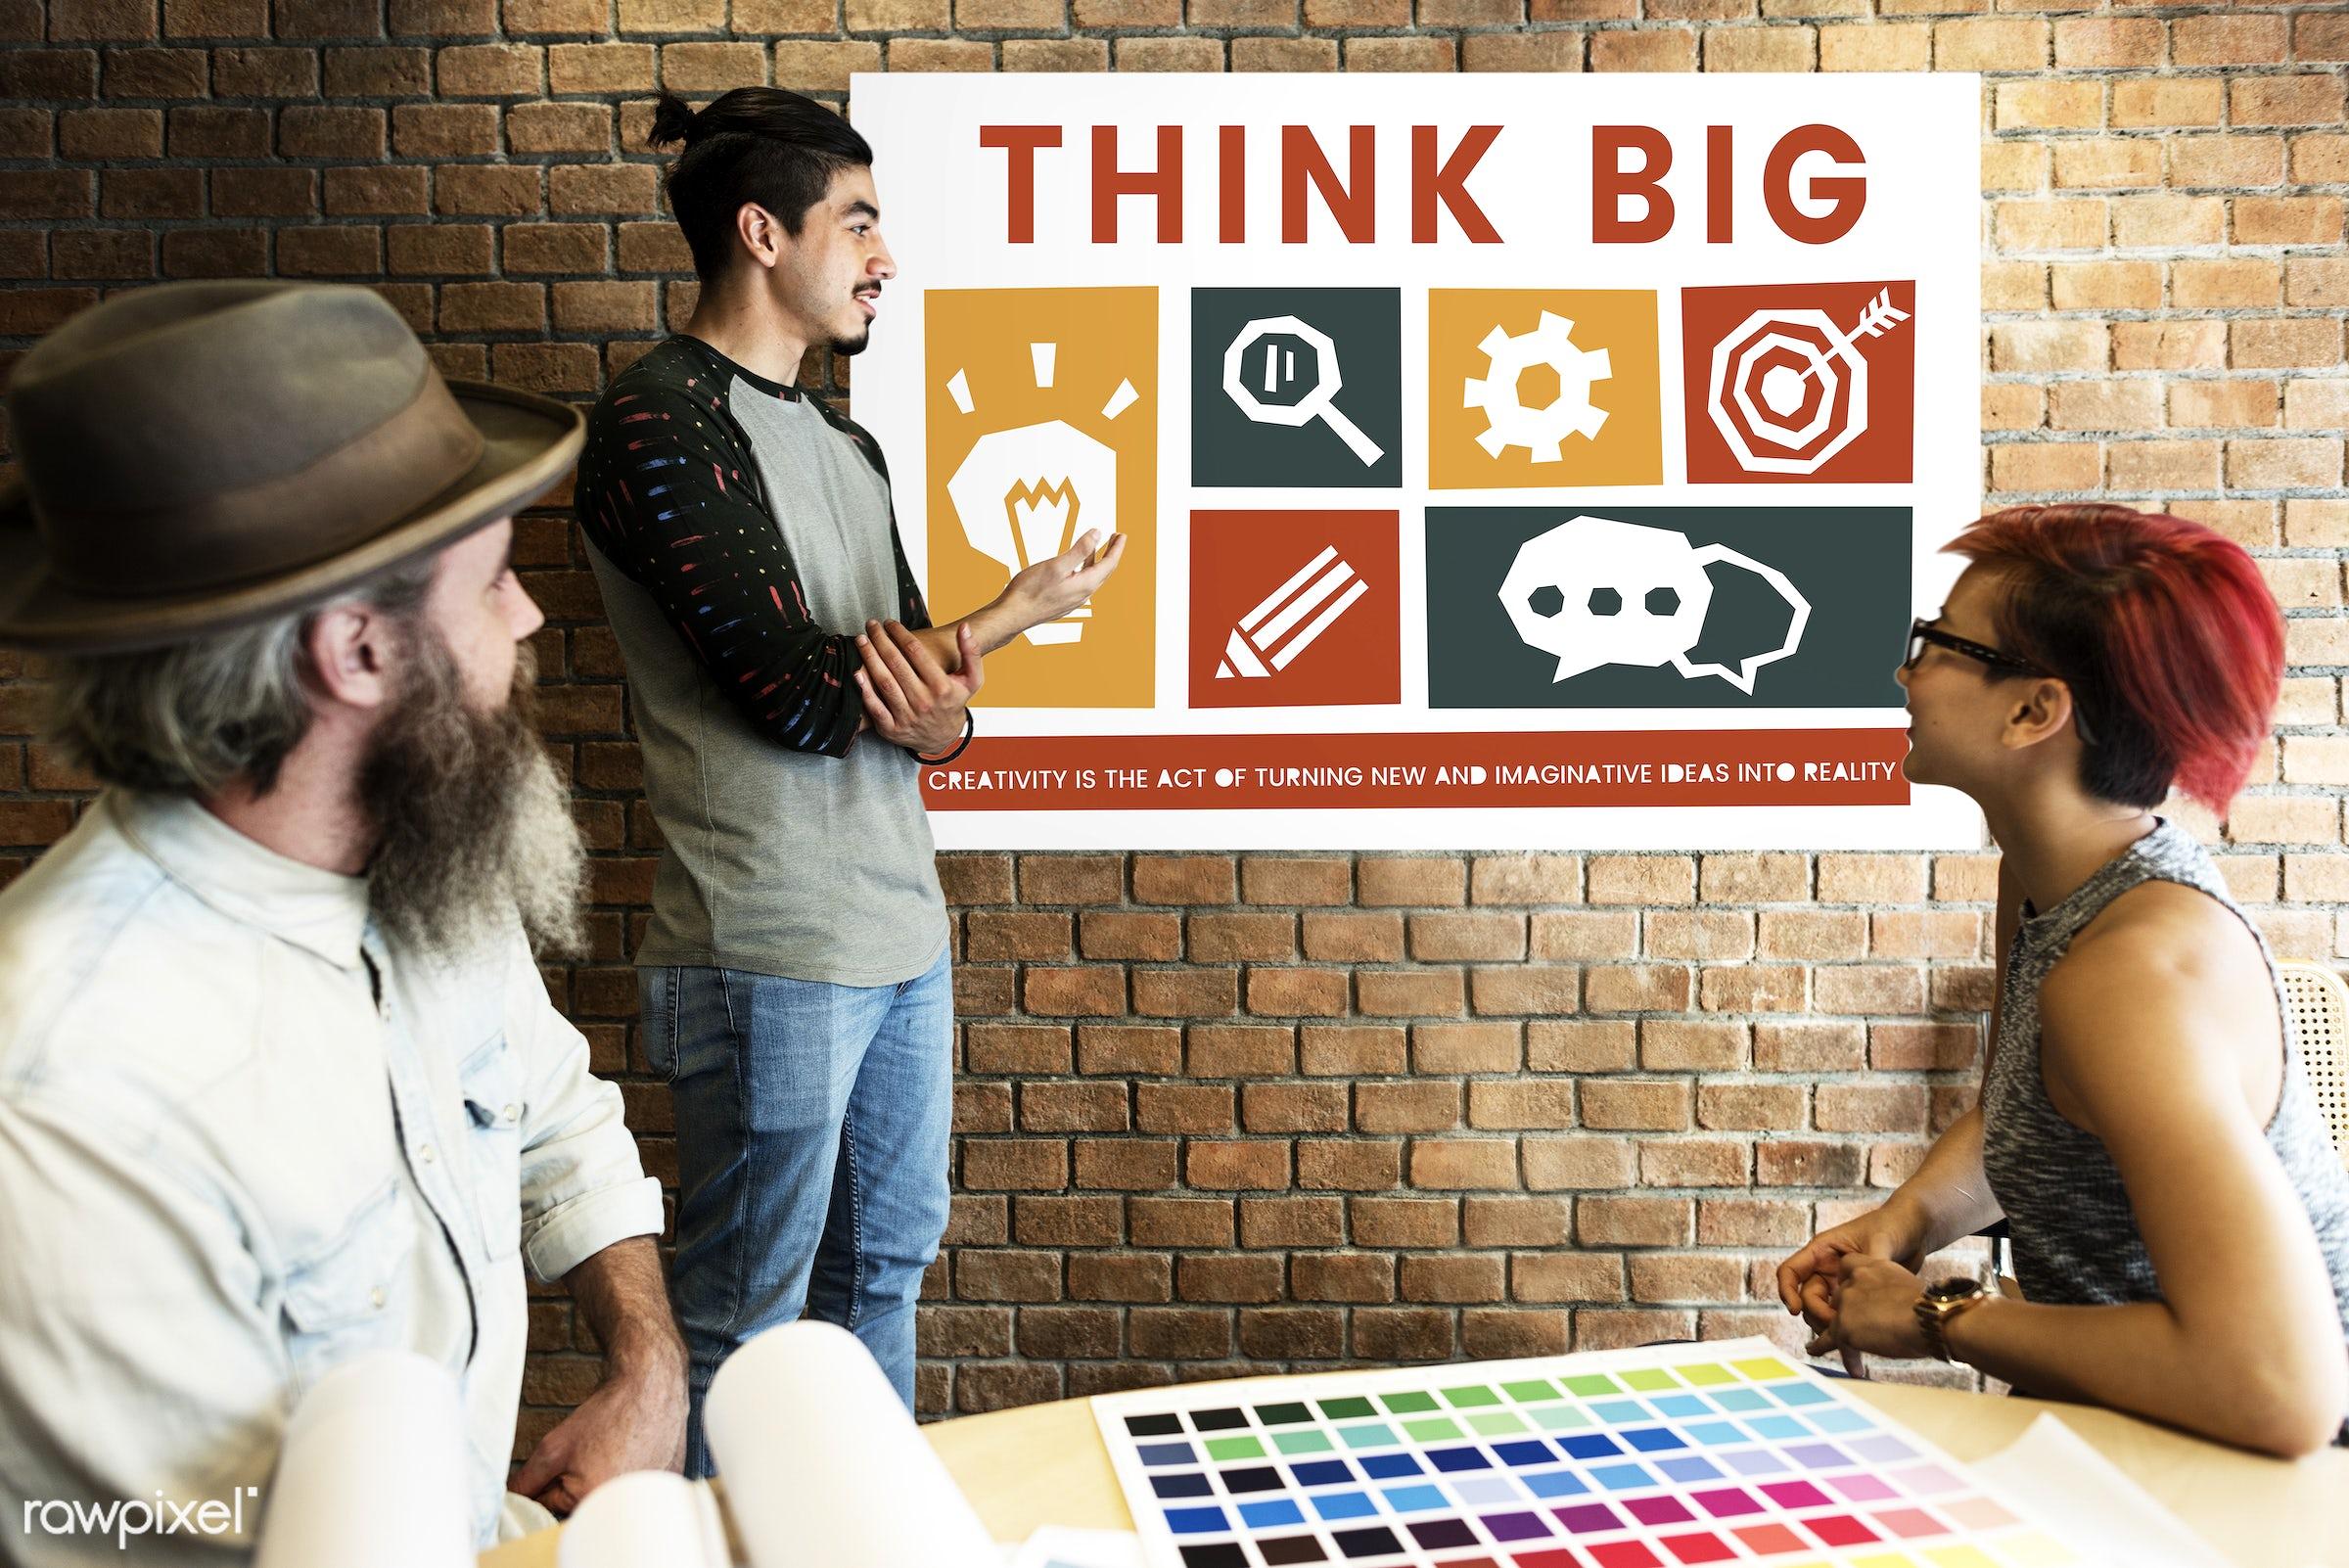 art, beard, big, board, brick wall, chart, chat, cog, color chart, colors, creative, creativity, design, discussion, female...